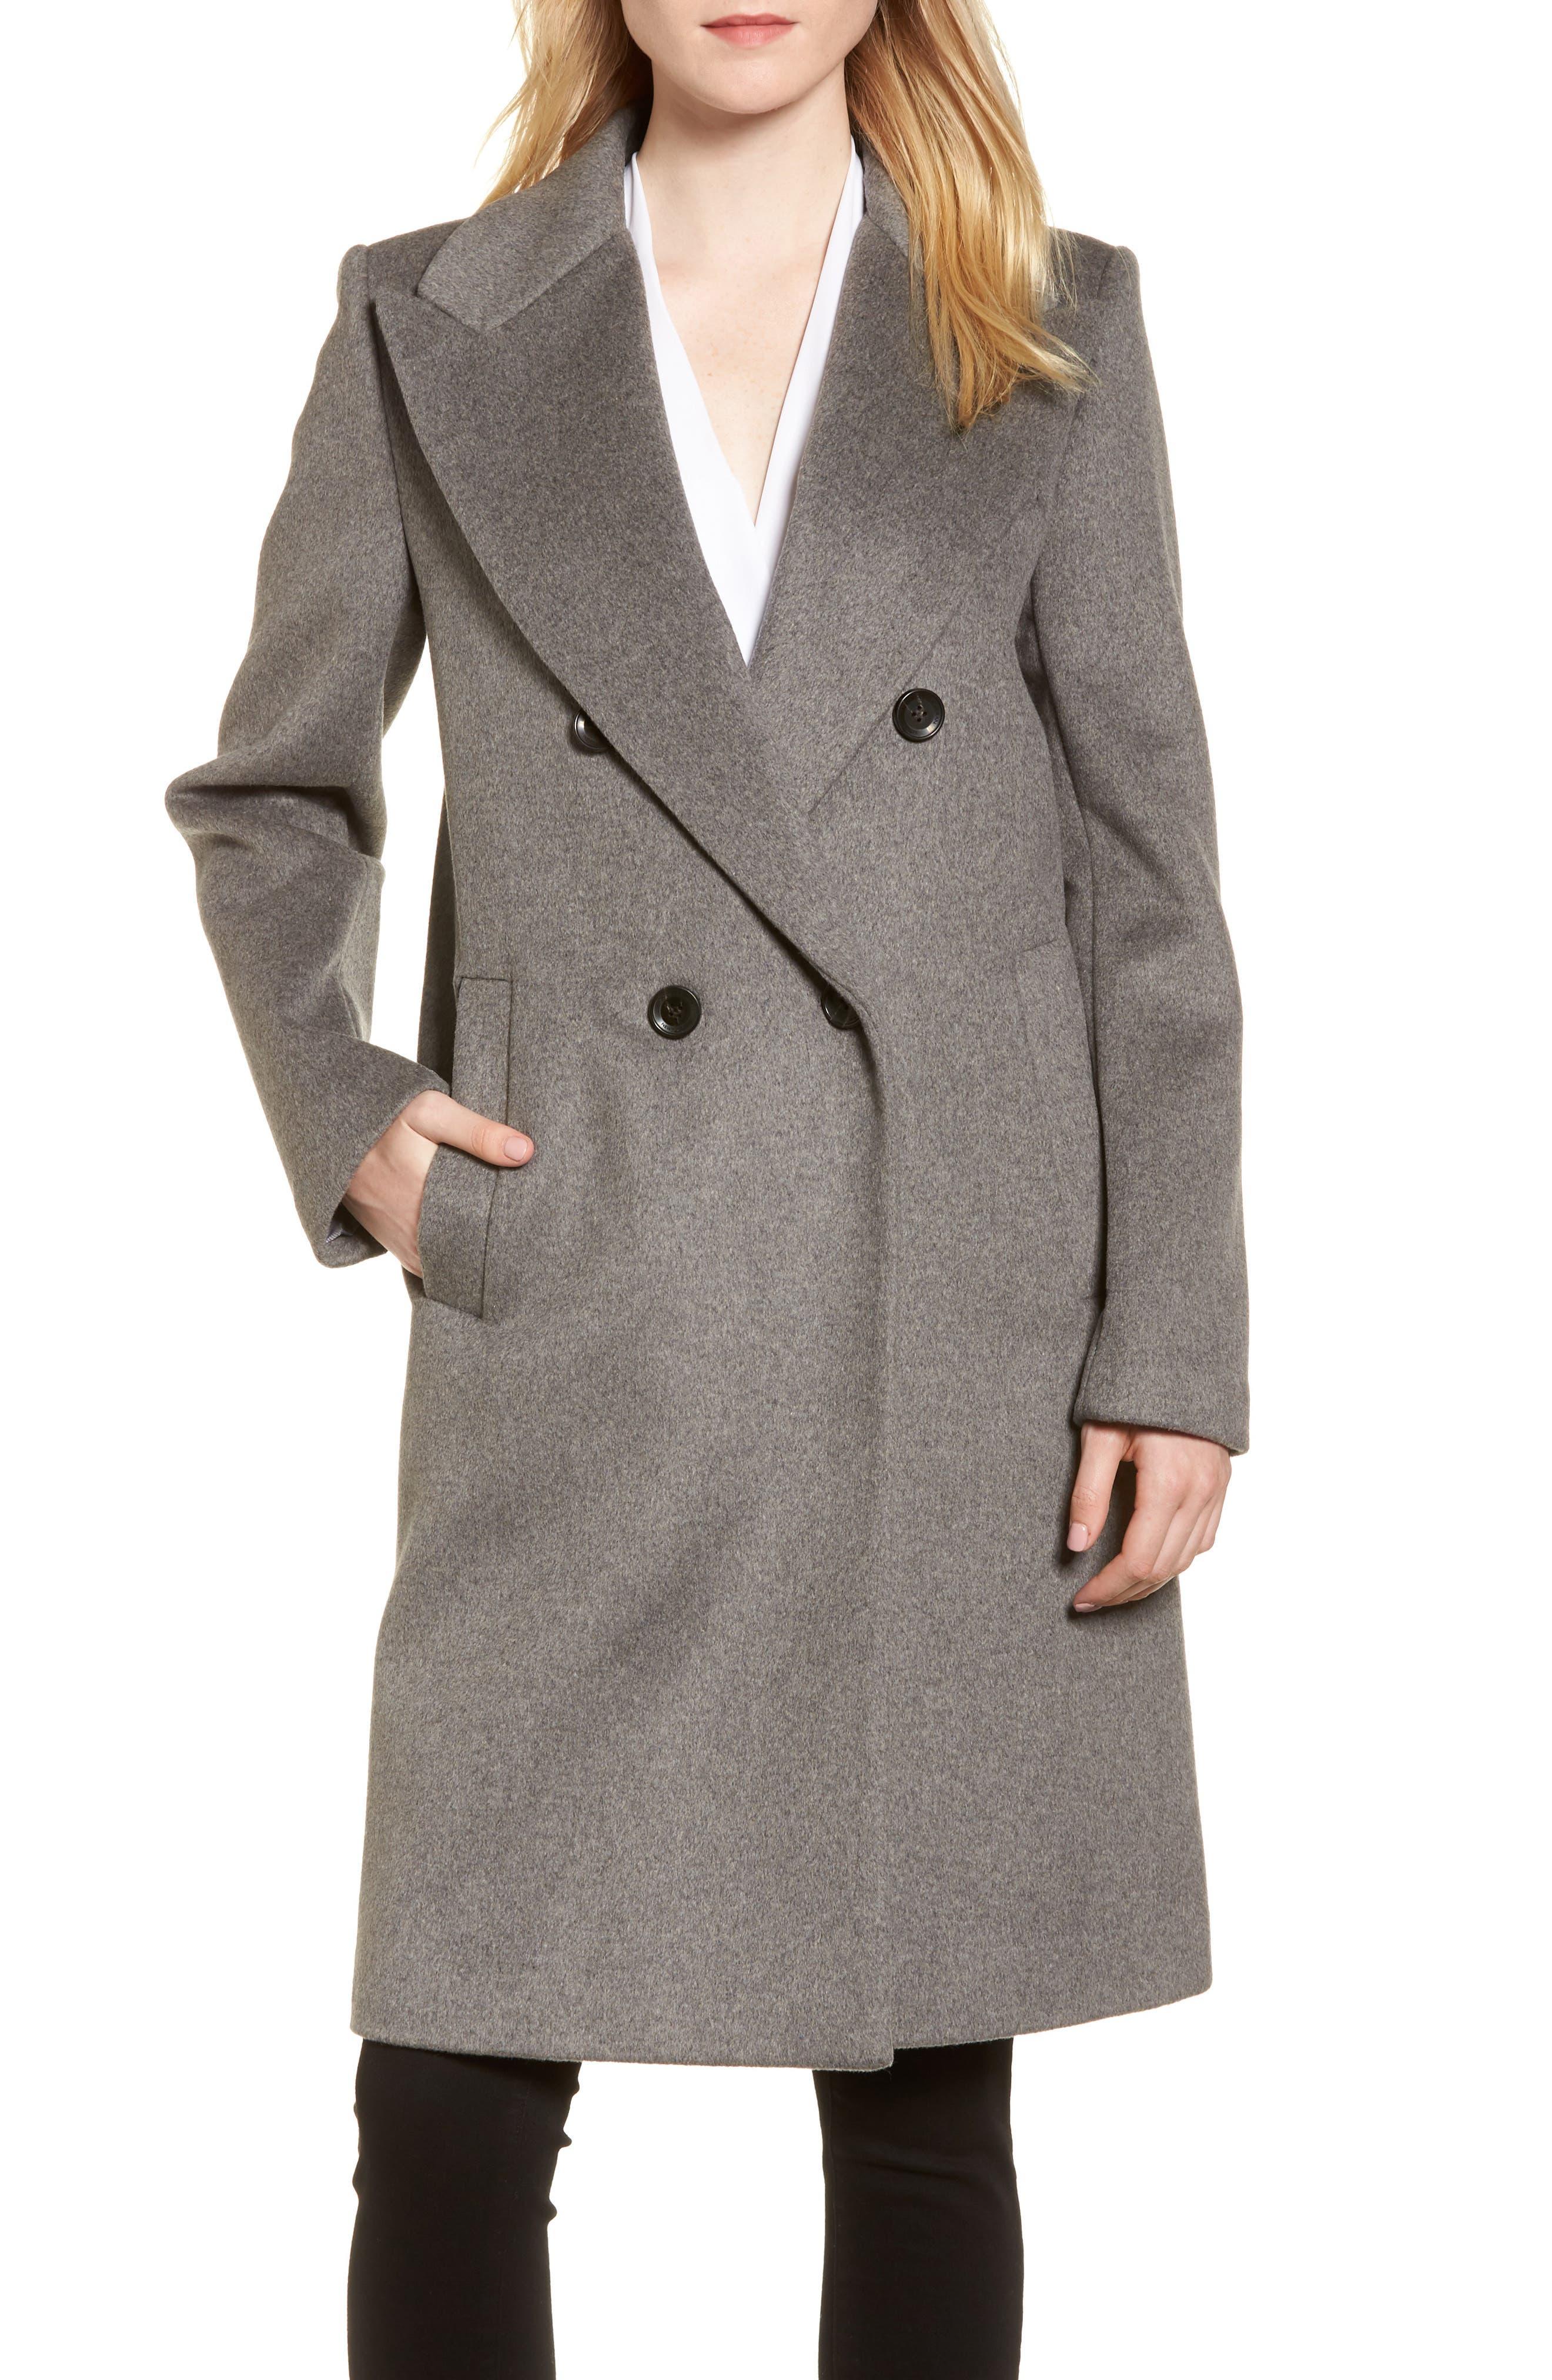 DKNY Lavish Wool Blend Coat